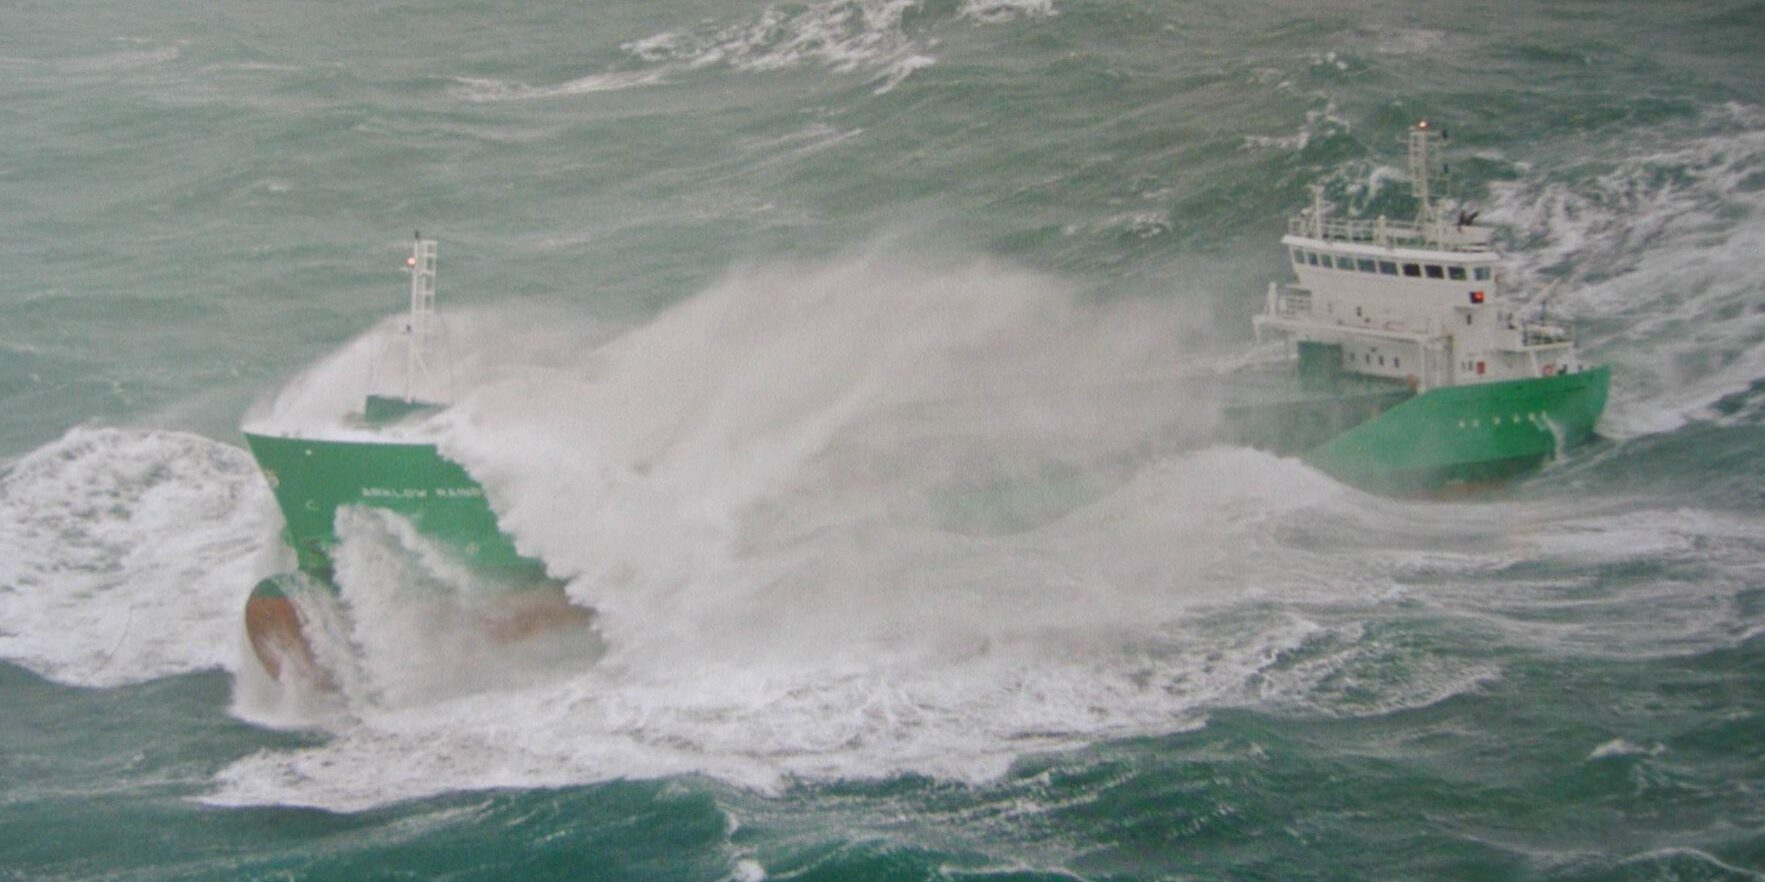 stb_web_ship-storm-ref_002